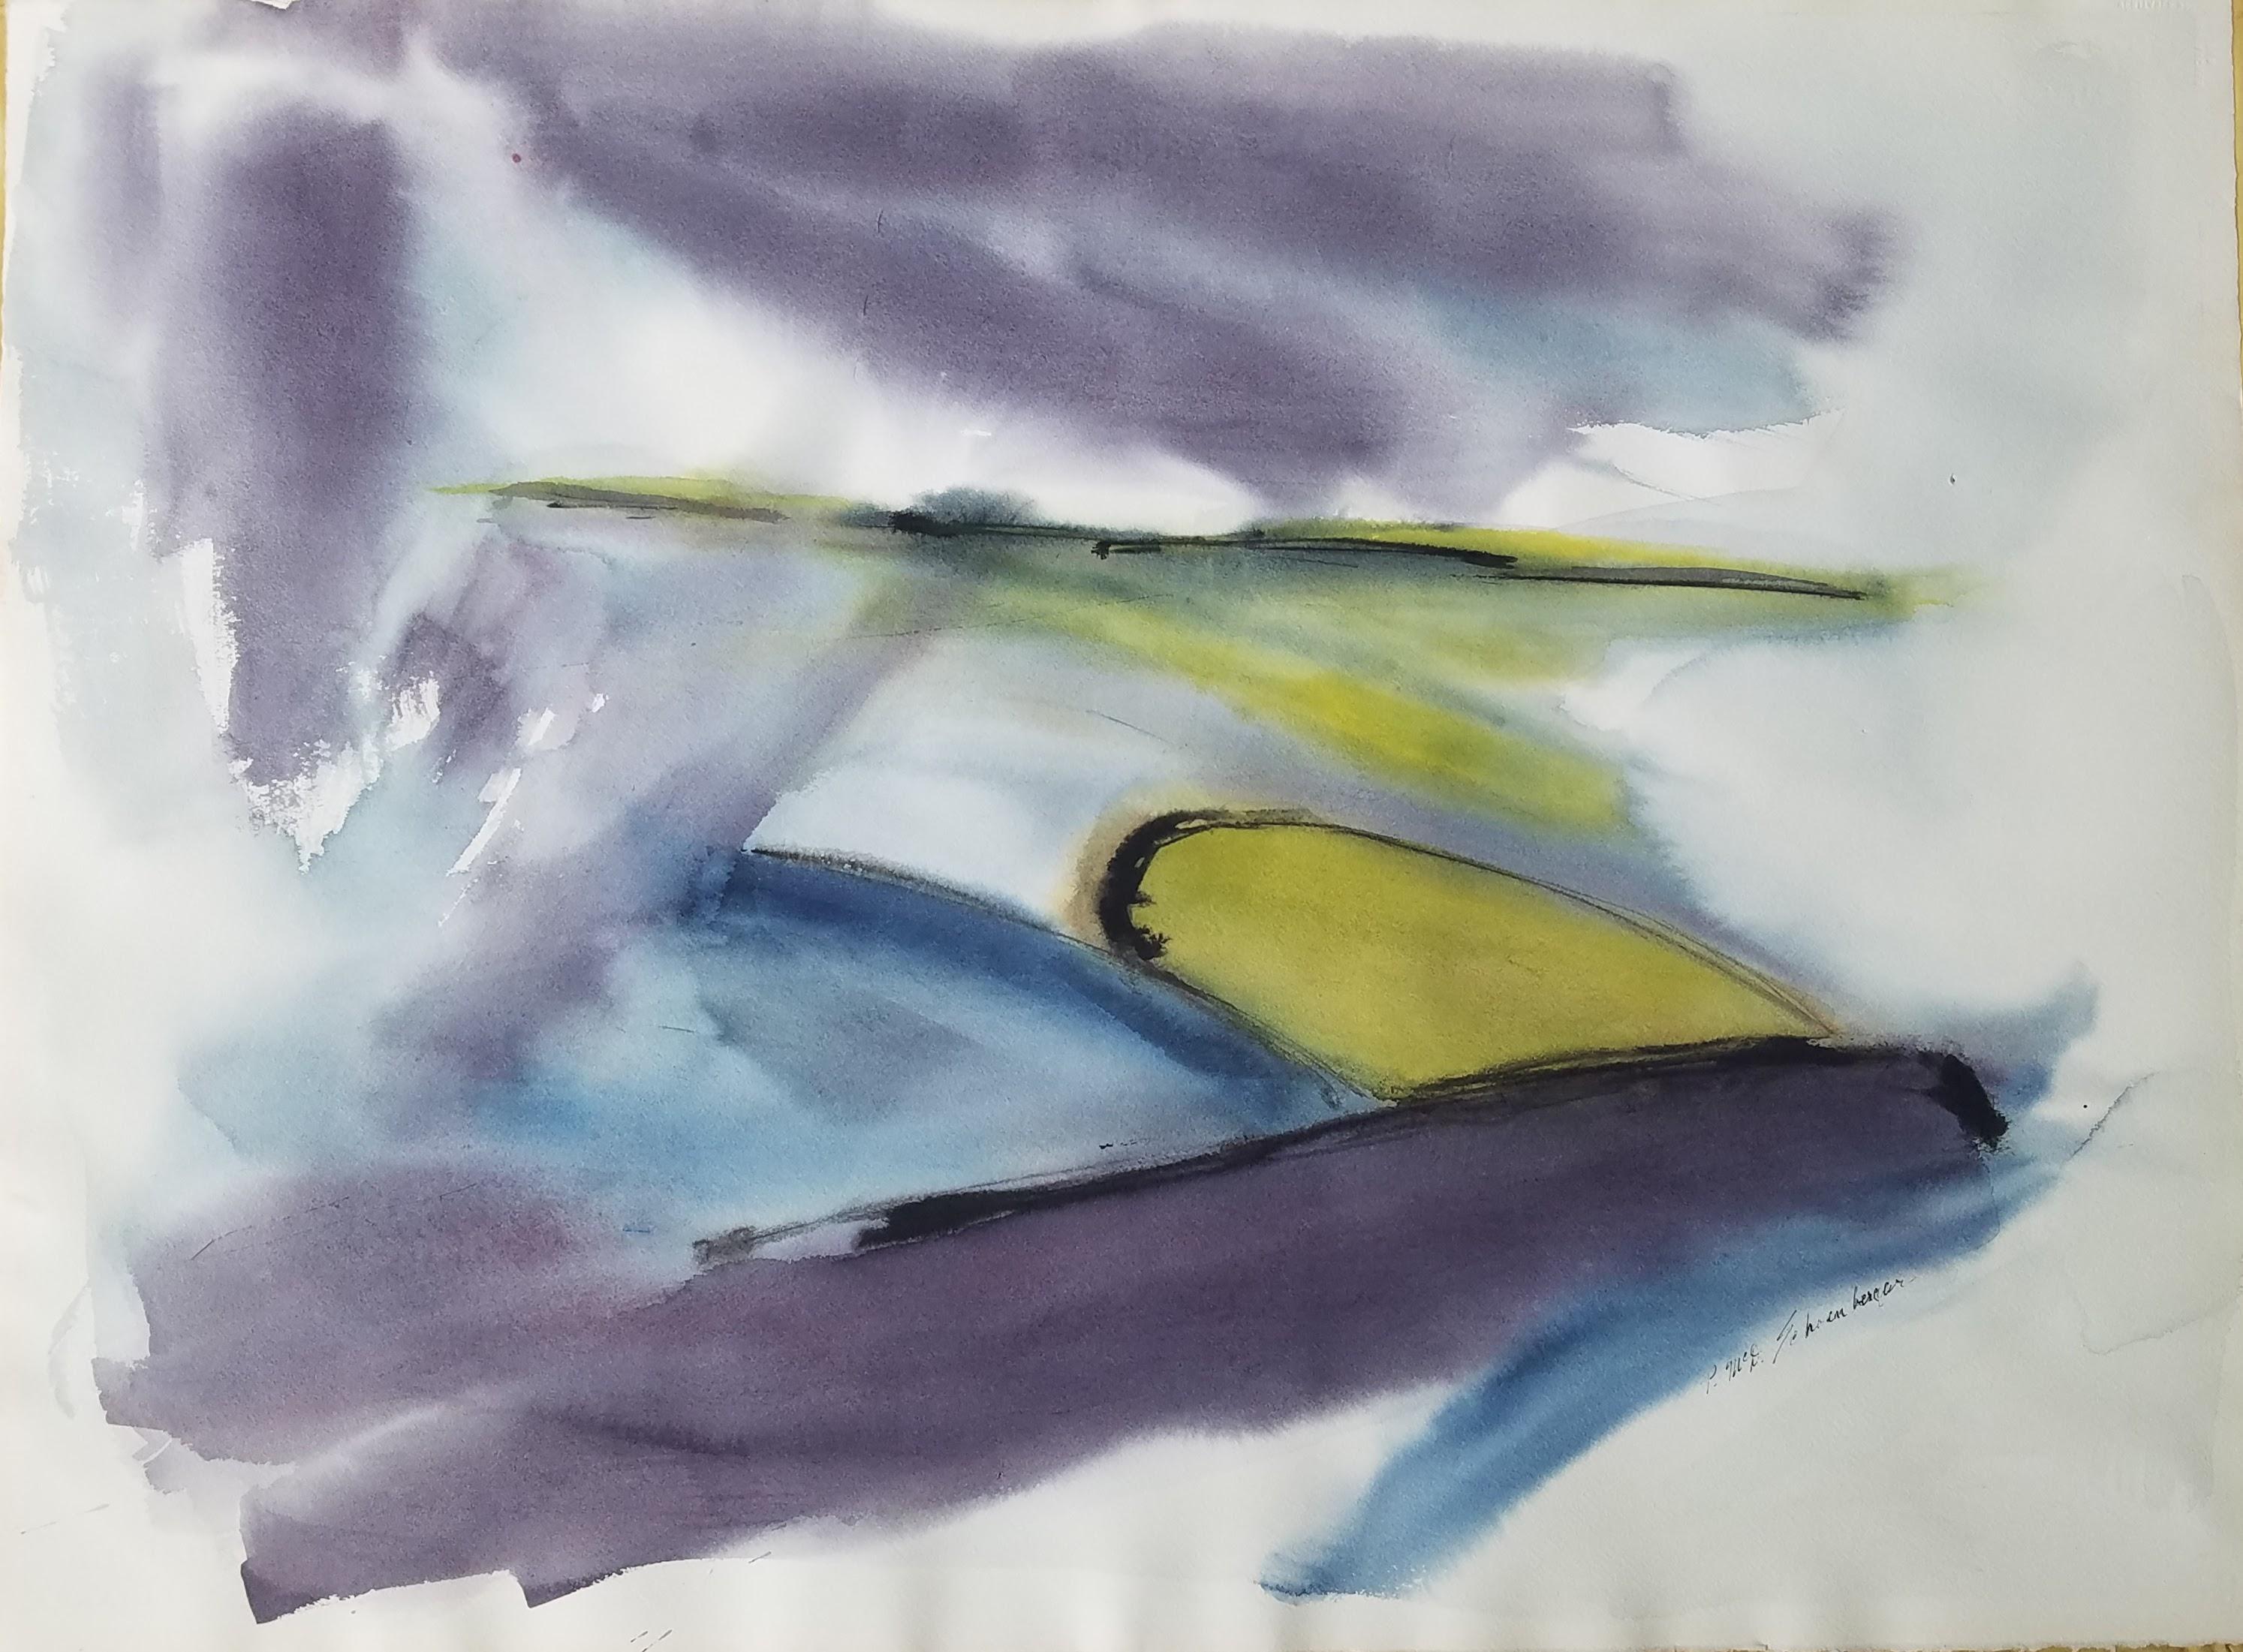 50) Coastal Violet Haze